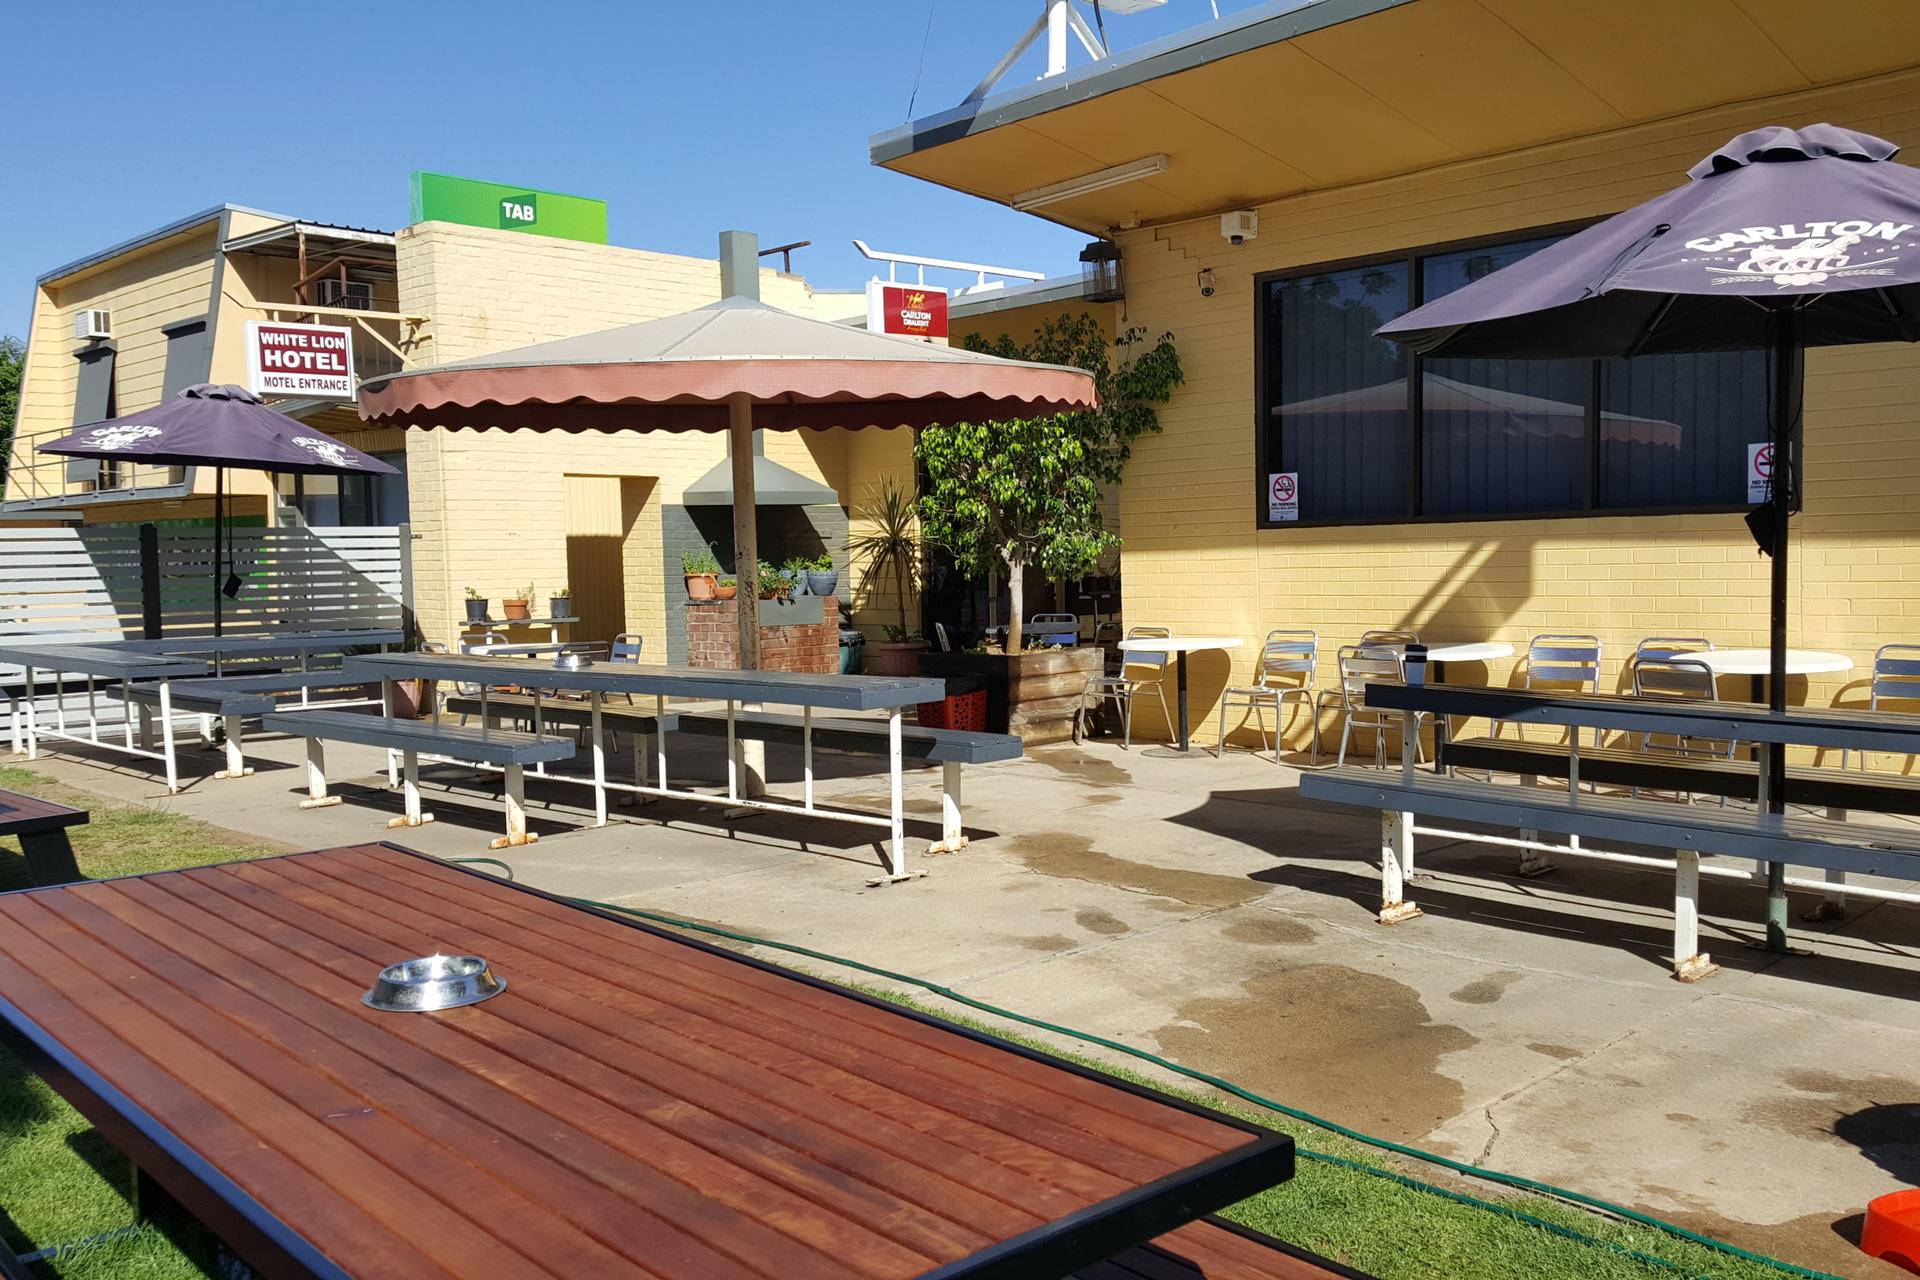 a - White Lion Hotel Motel